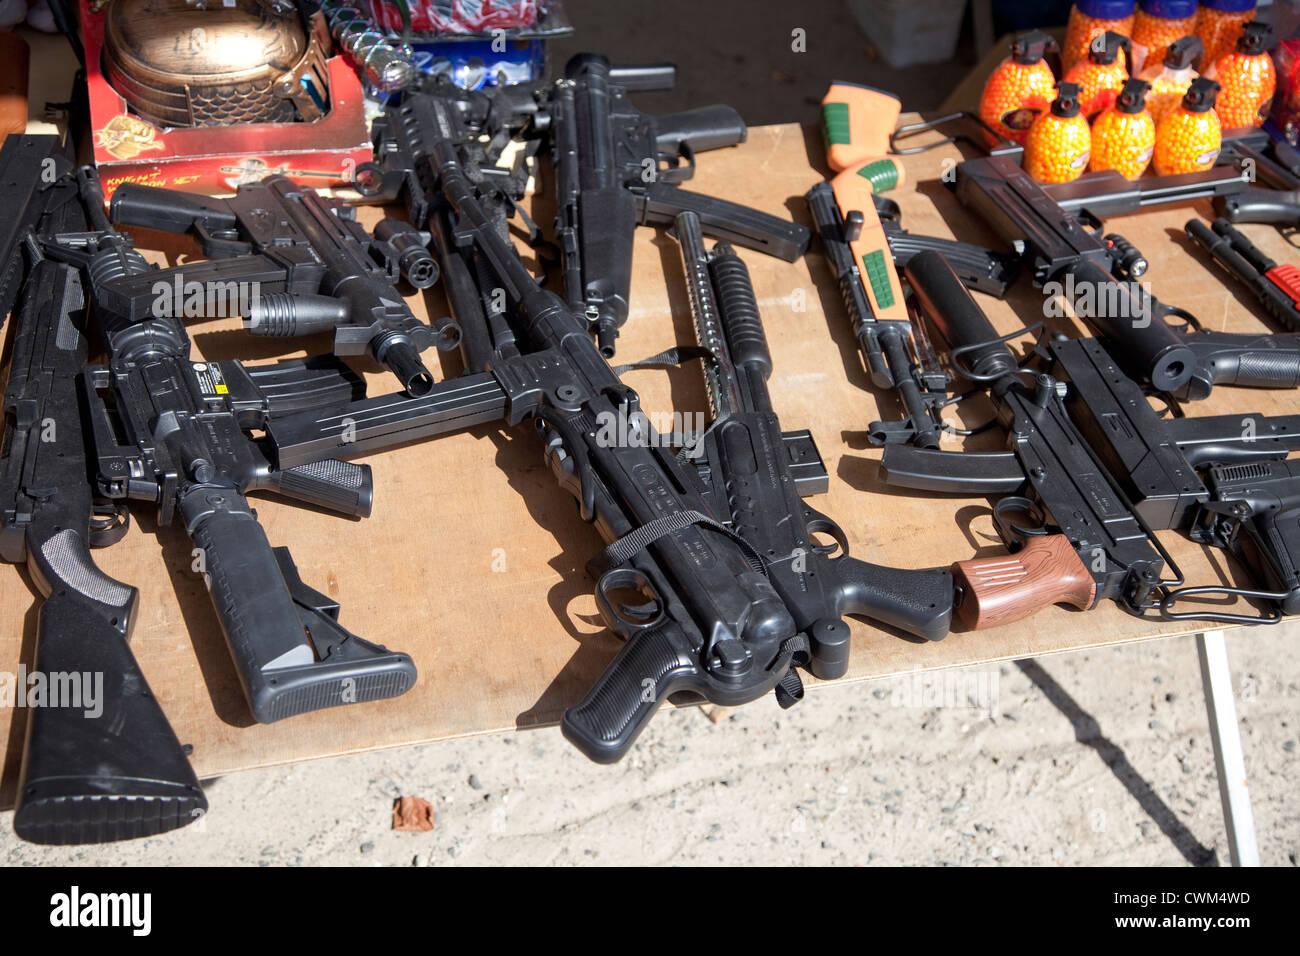 Replica assault rifles, guns and grenades for sale at sidewalk flea market. Rzeczyca Central Poland - Stock Image